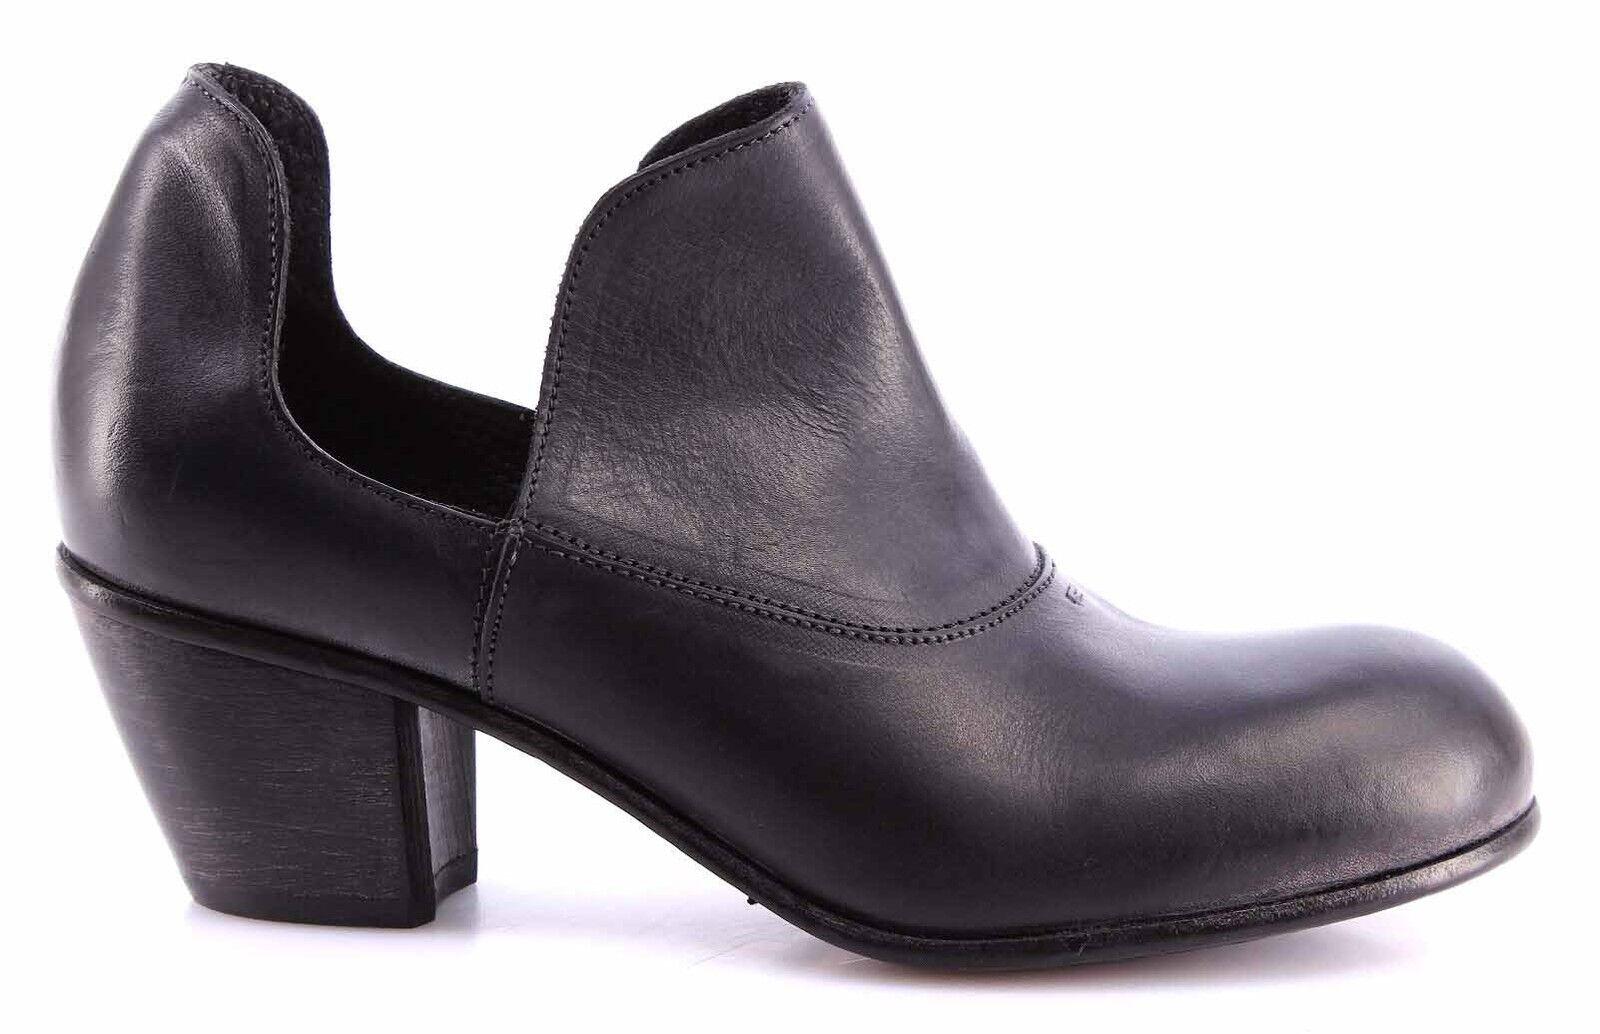 Damen Pumps Schuhe MOMA 44503-1A Albino Leder Schwarz Vintage Made  Neue